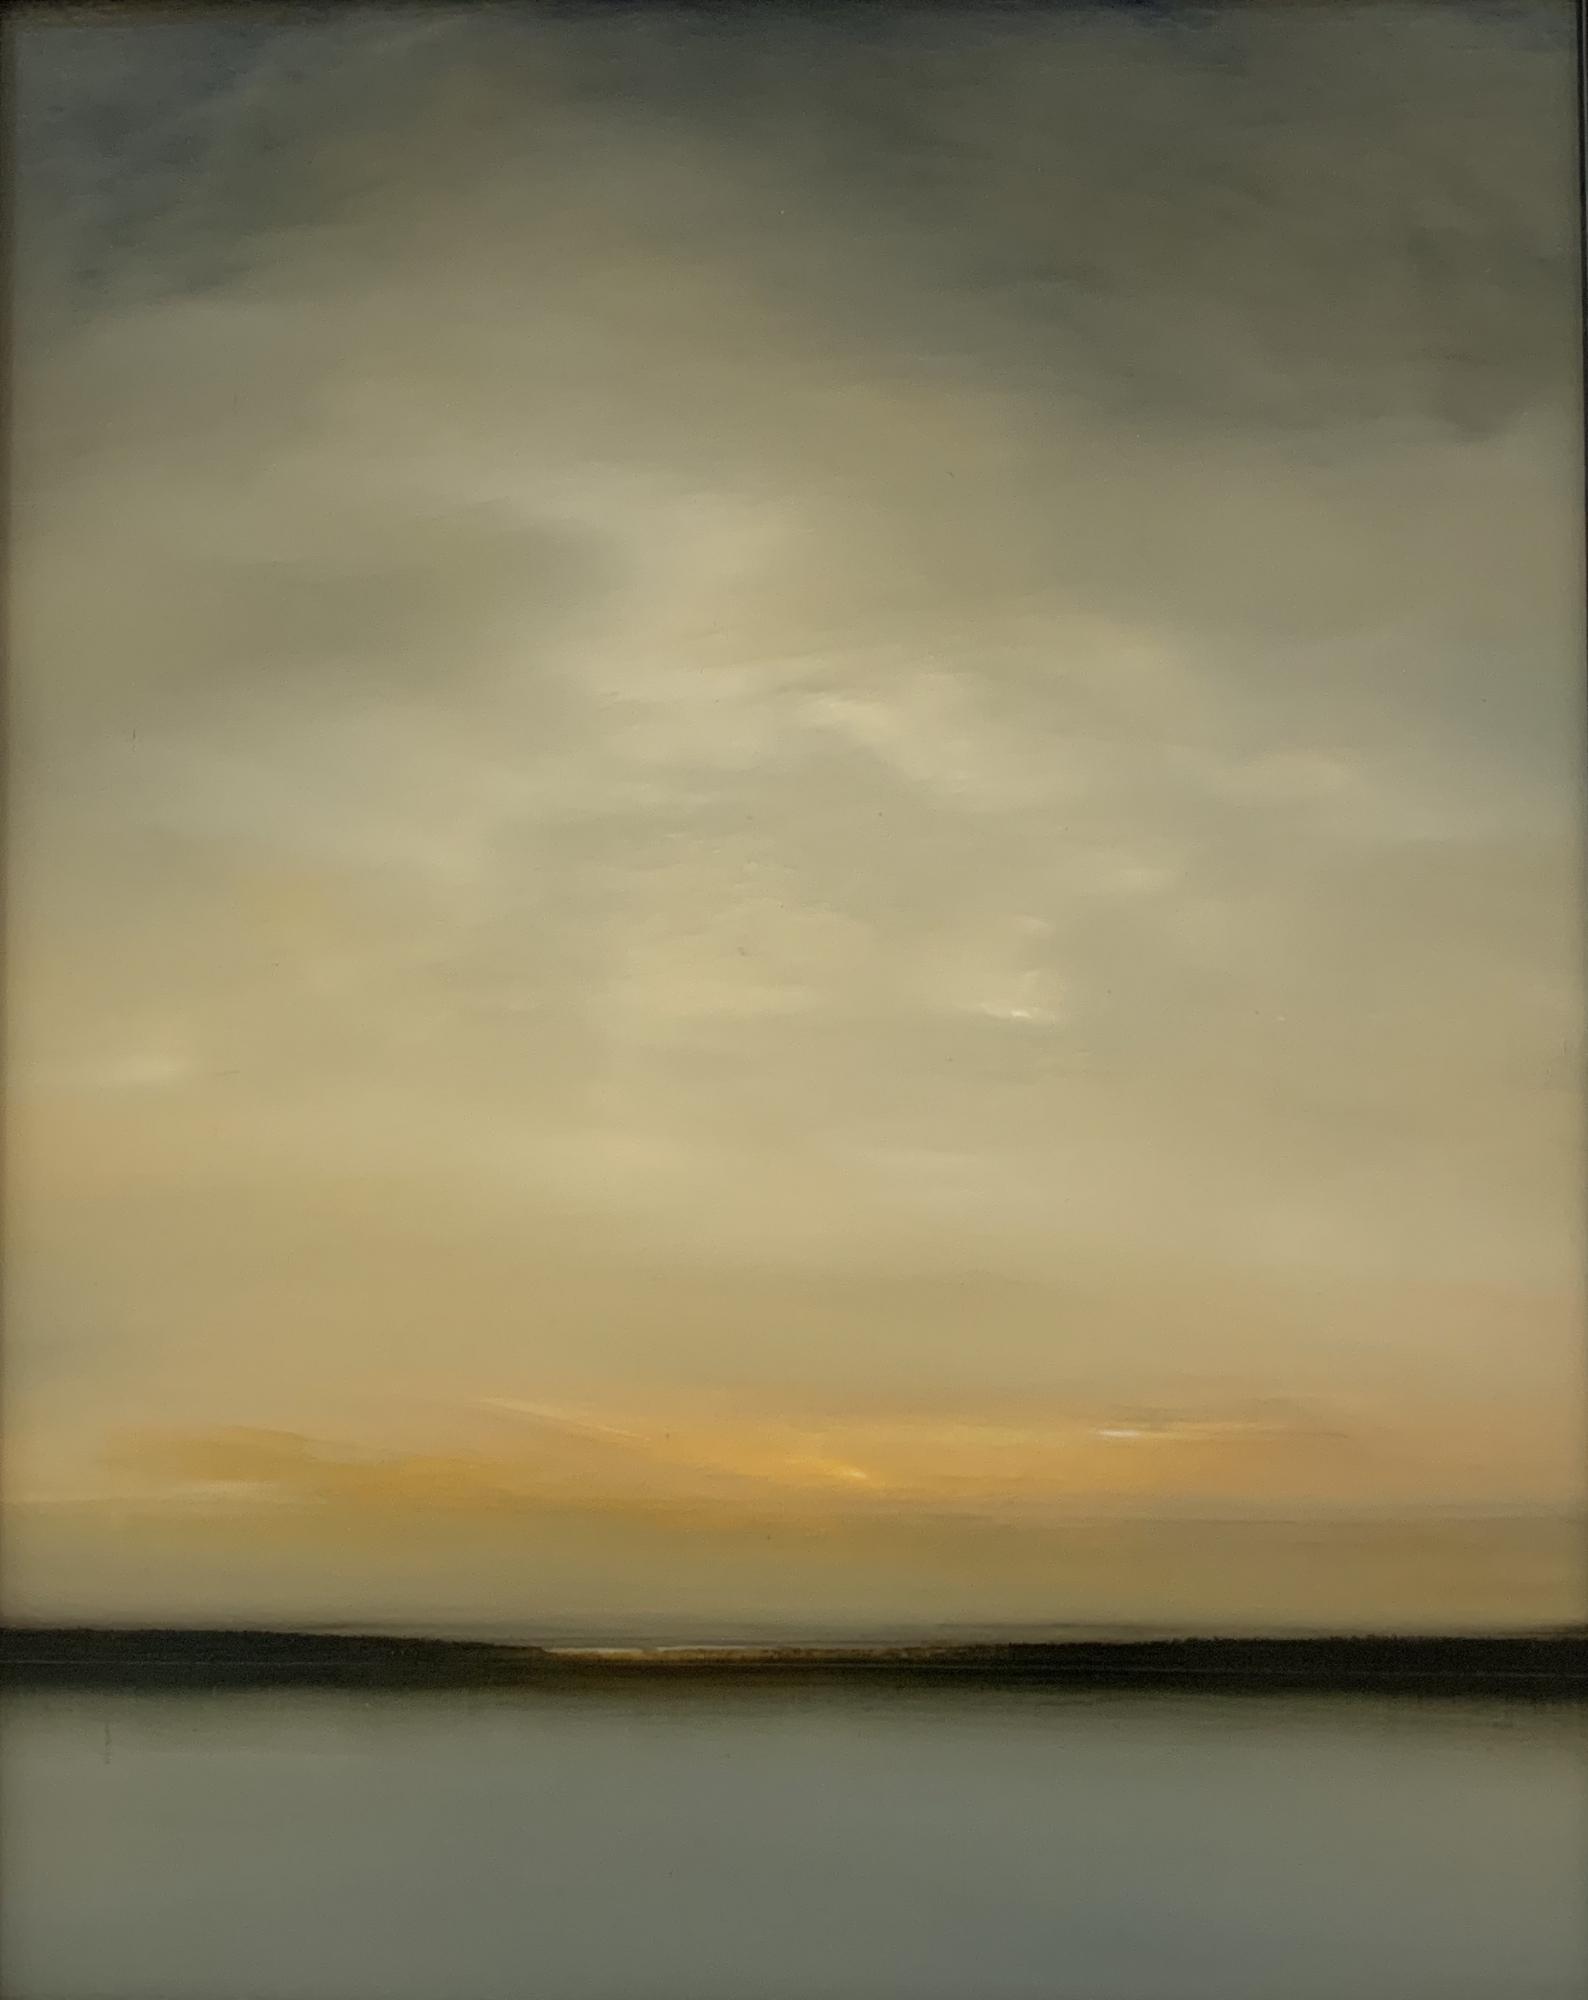 Medium Landscape 4 by Scott Steele